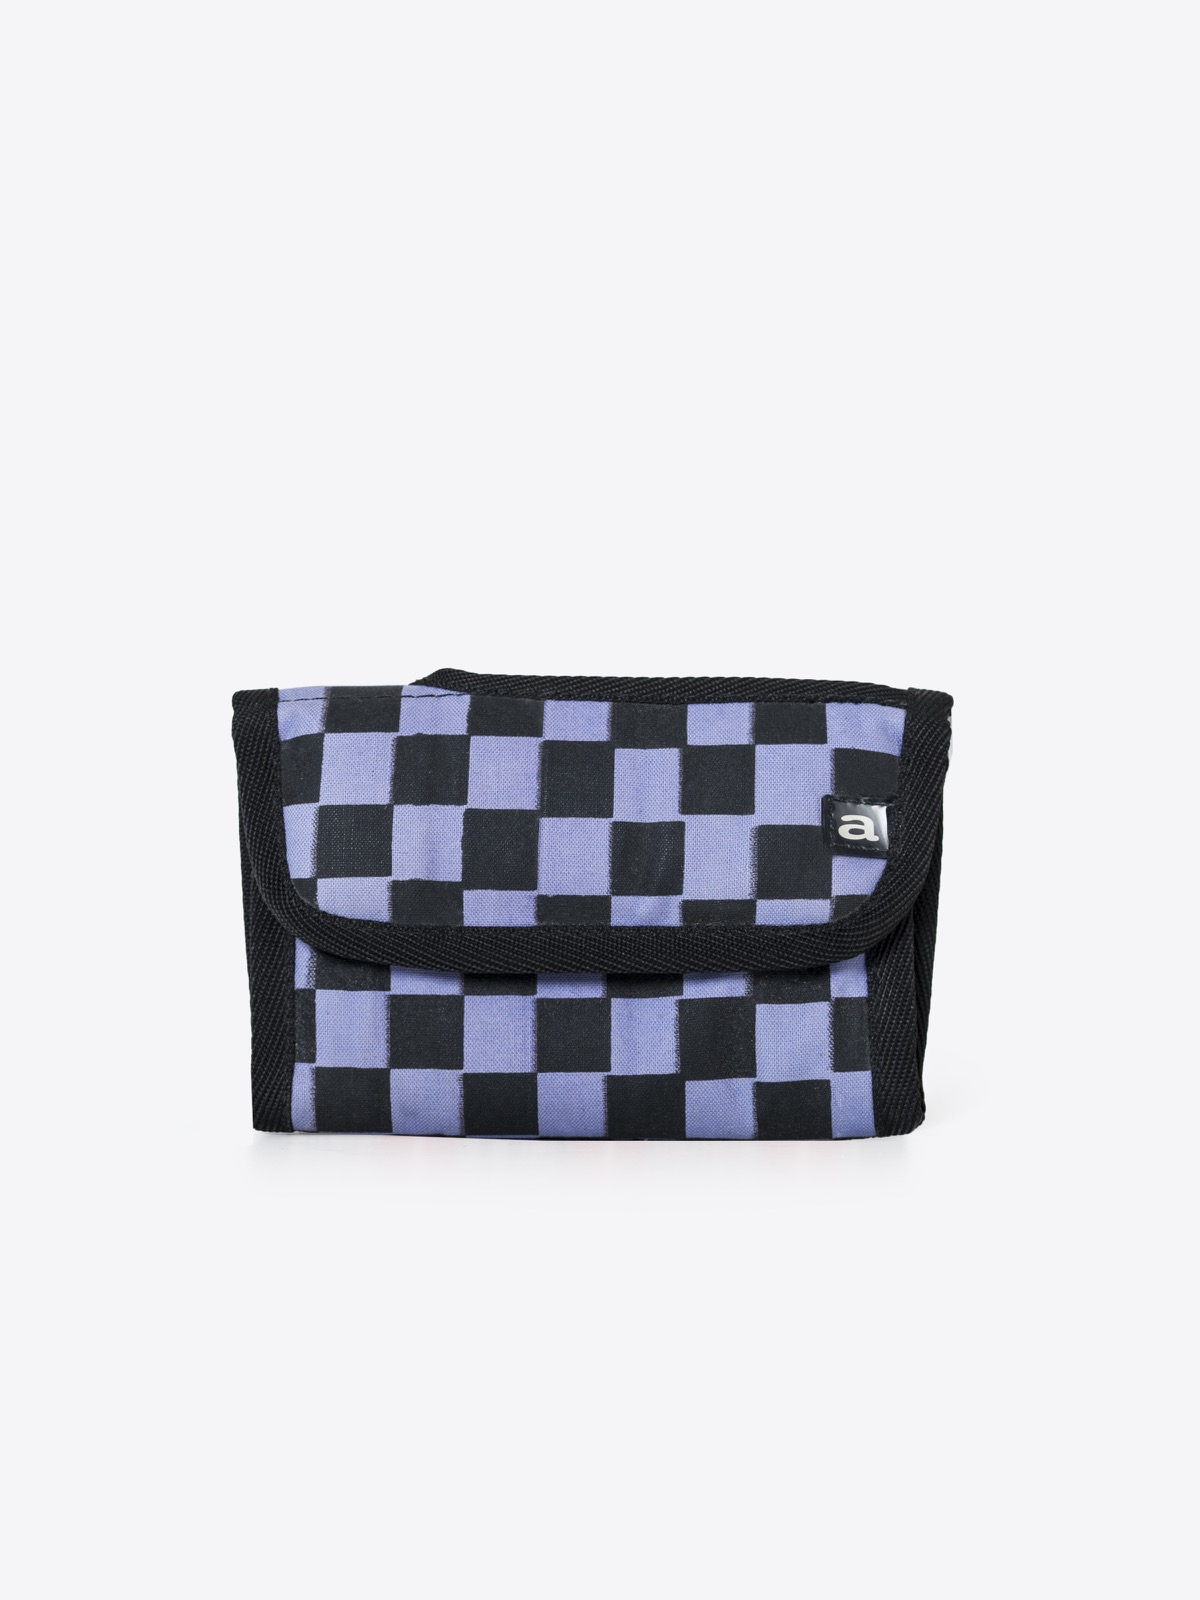 airbag craftworks palermo | 356